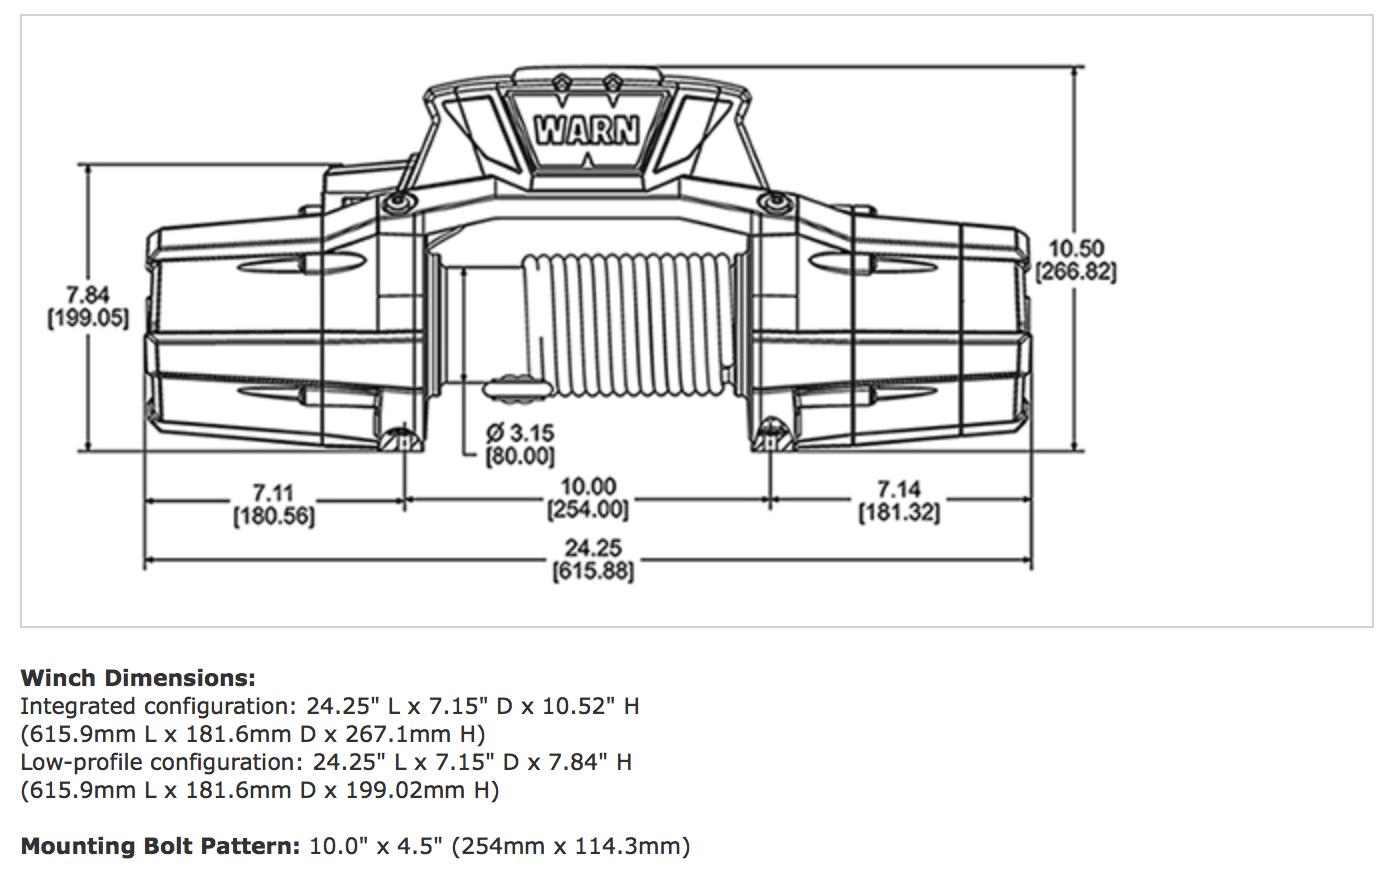 Smittybilt Xrc Wiring Diagram - Wiring Solutions